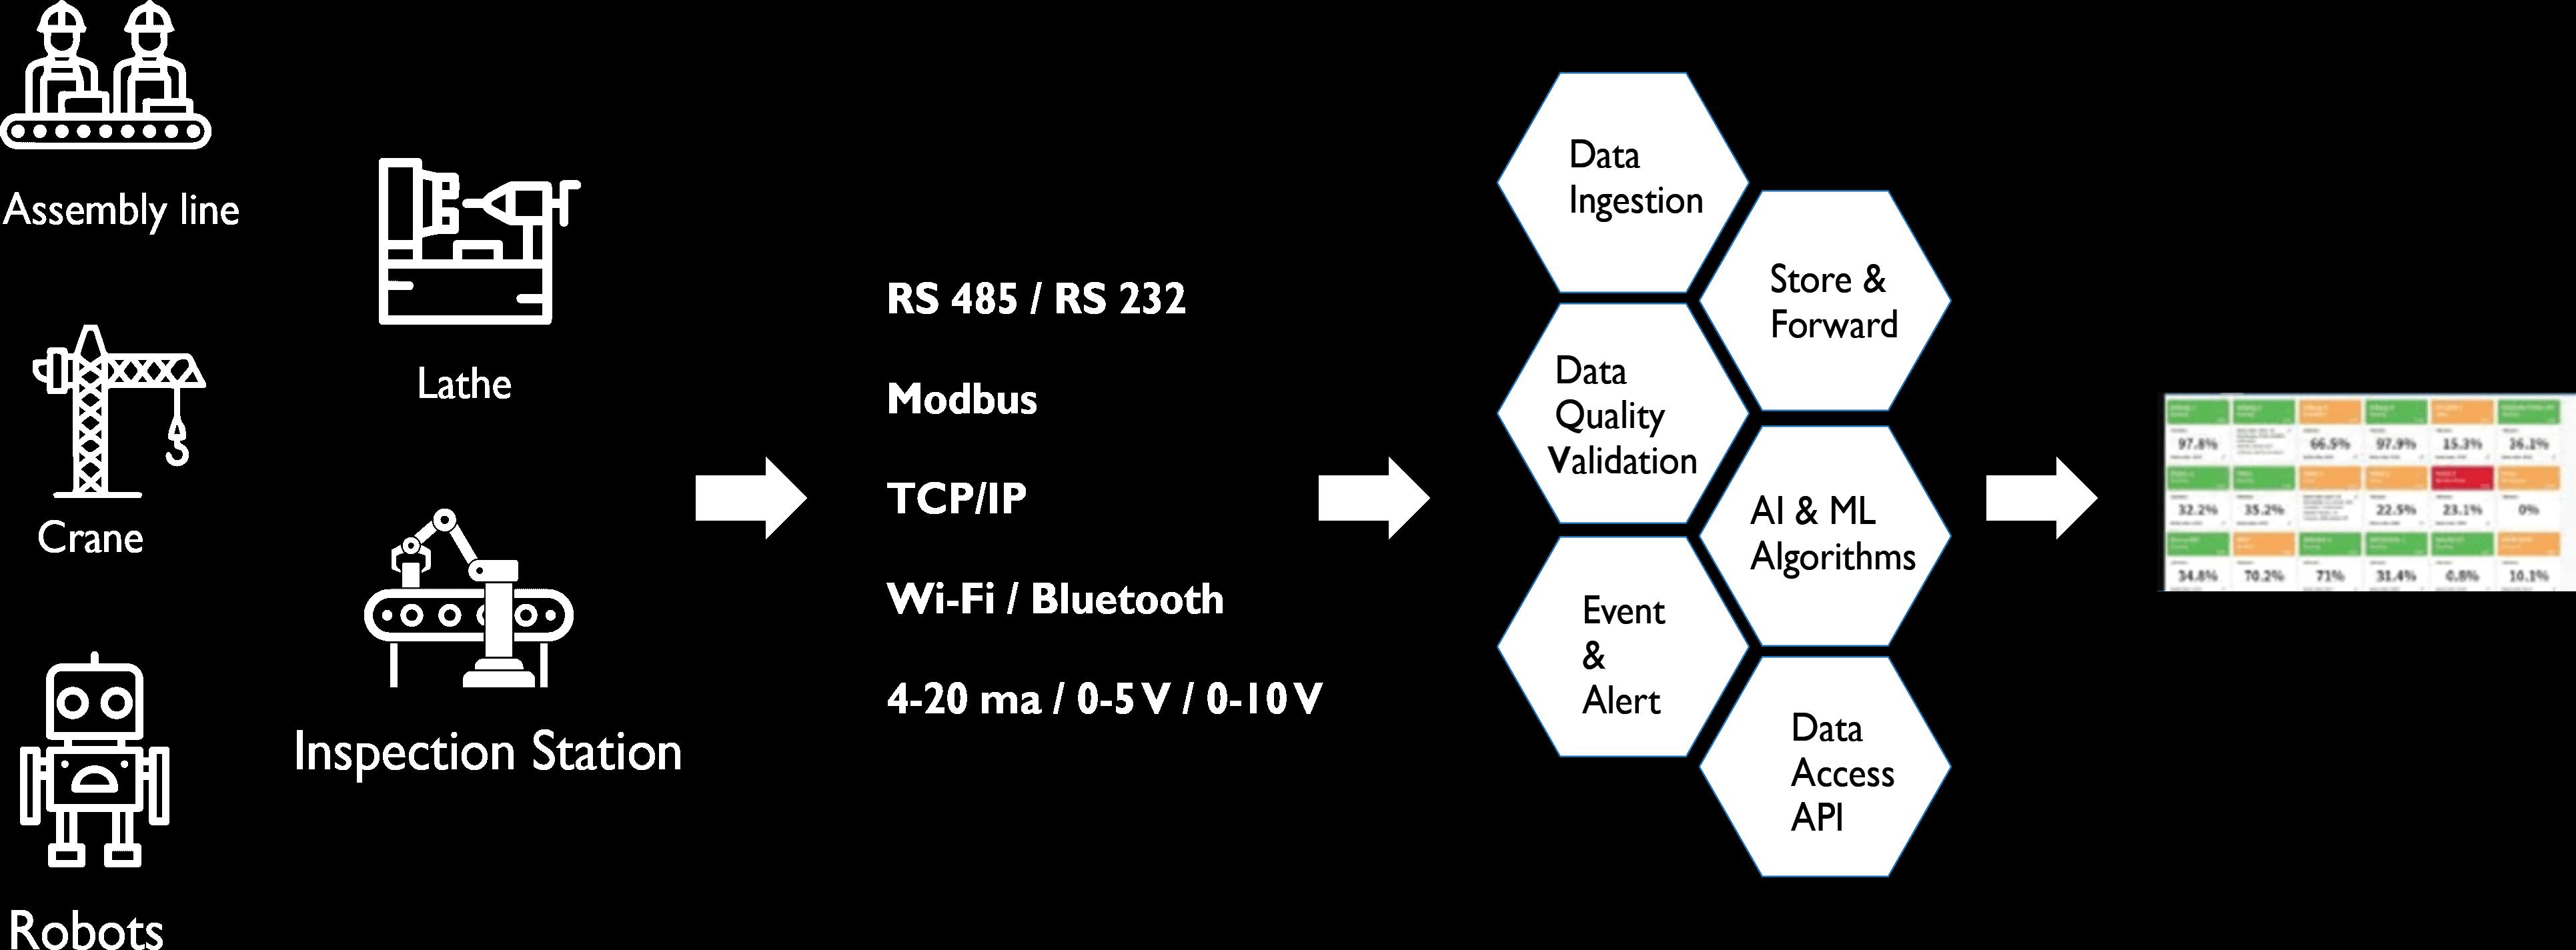 iot sensor data analytics